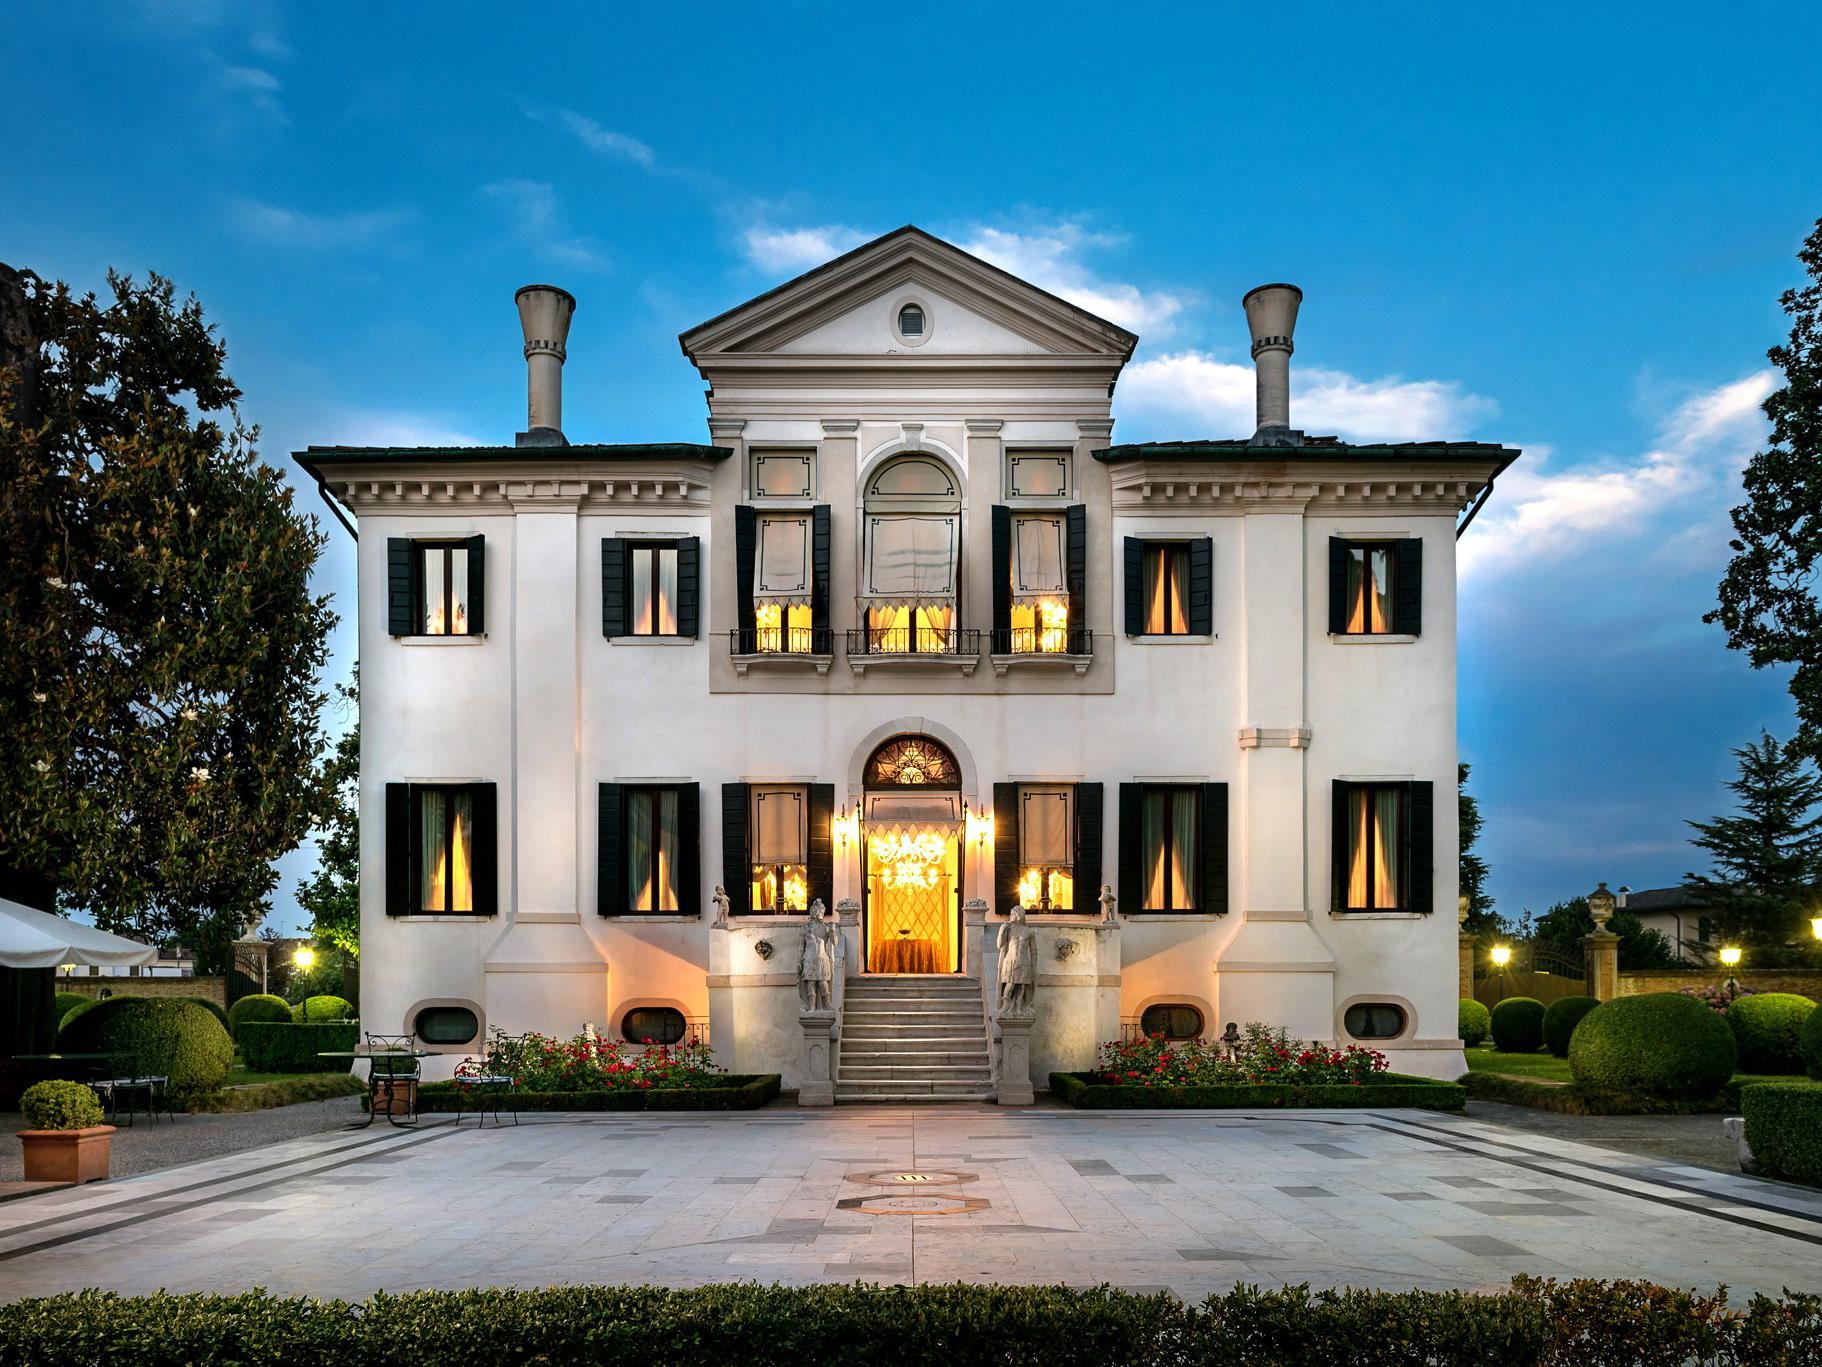 Hotel Villa Franceschi